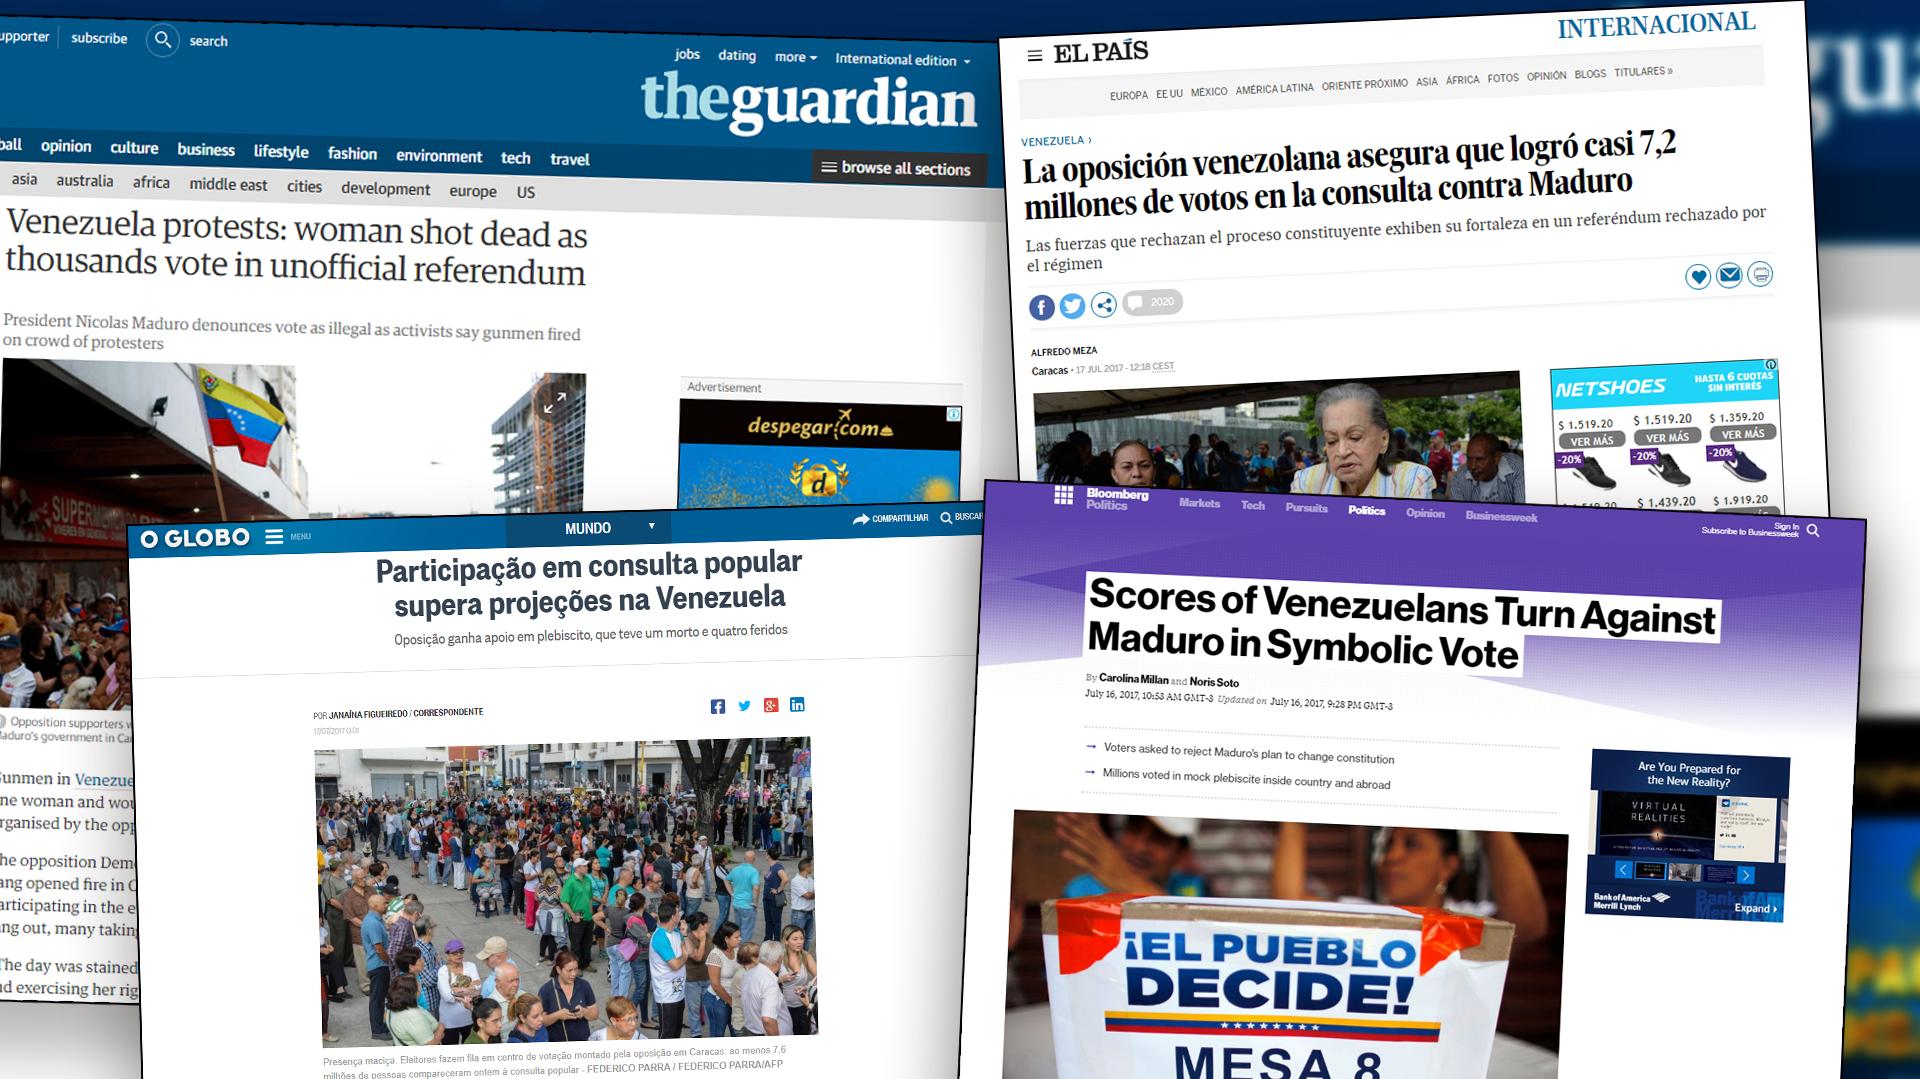 https://s3.amazonaws.com/arc-wordpress-client-uploads/infobae-wp/wp-content/uploads/2017/07/17075535/notas-de-la-prensa-sobre-Venezuela-1920.jpg